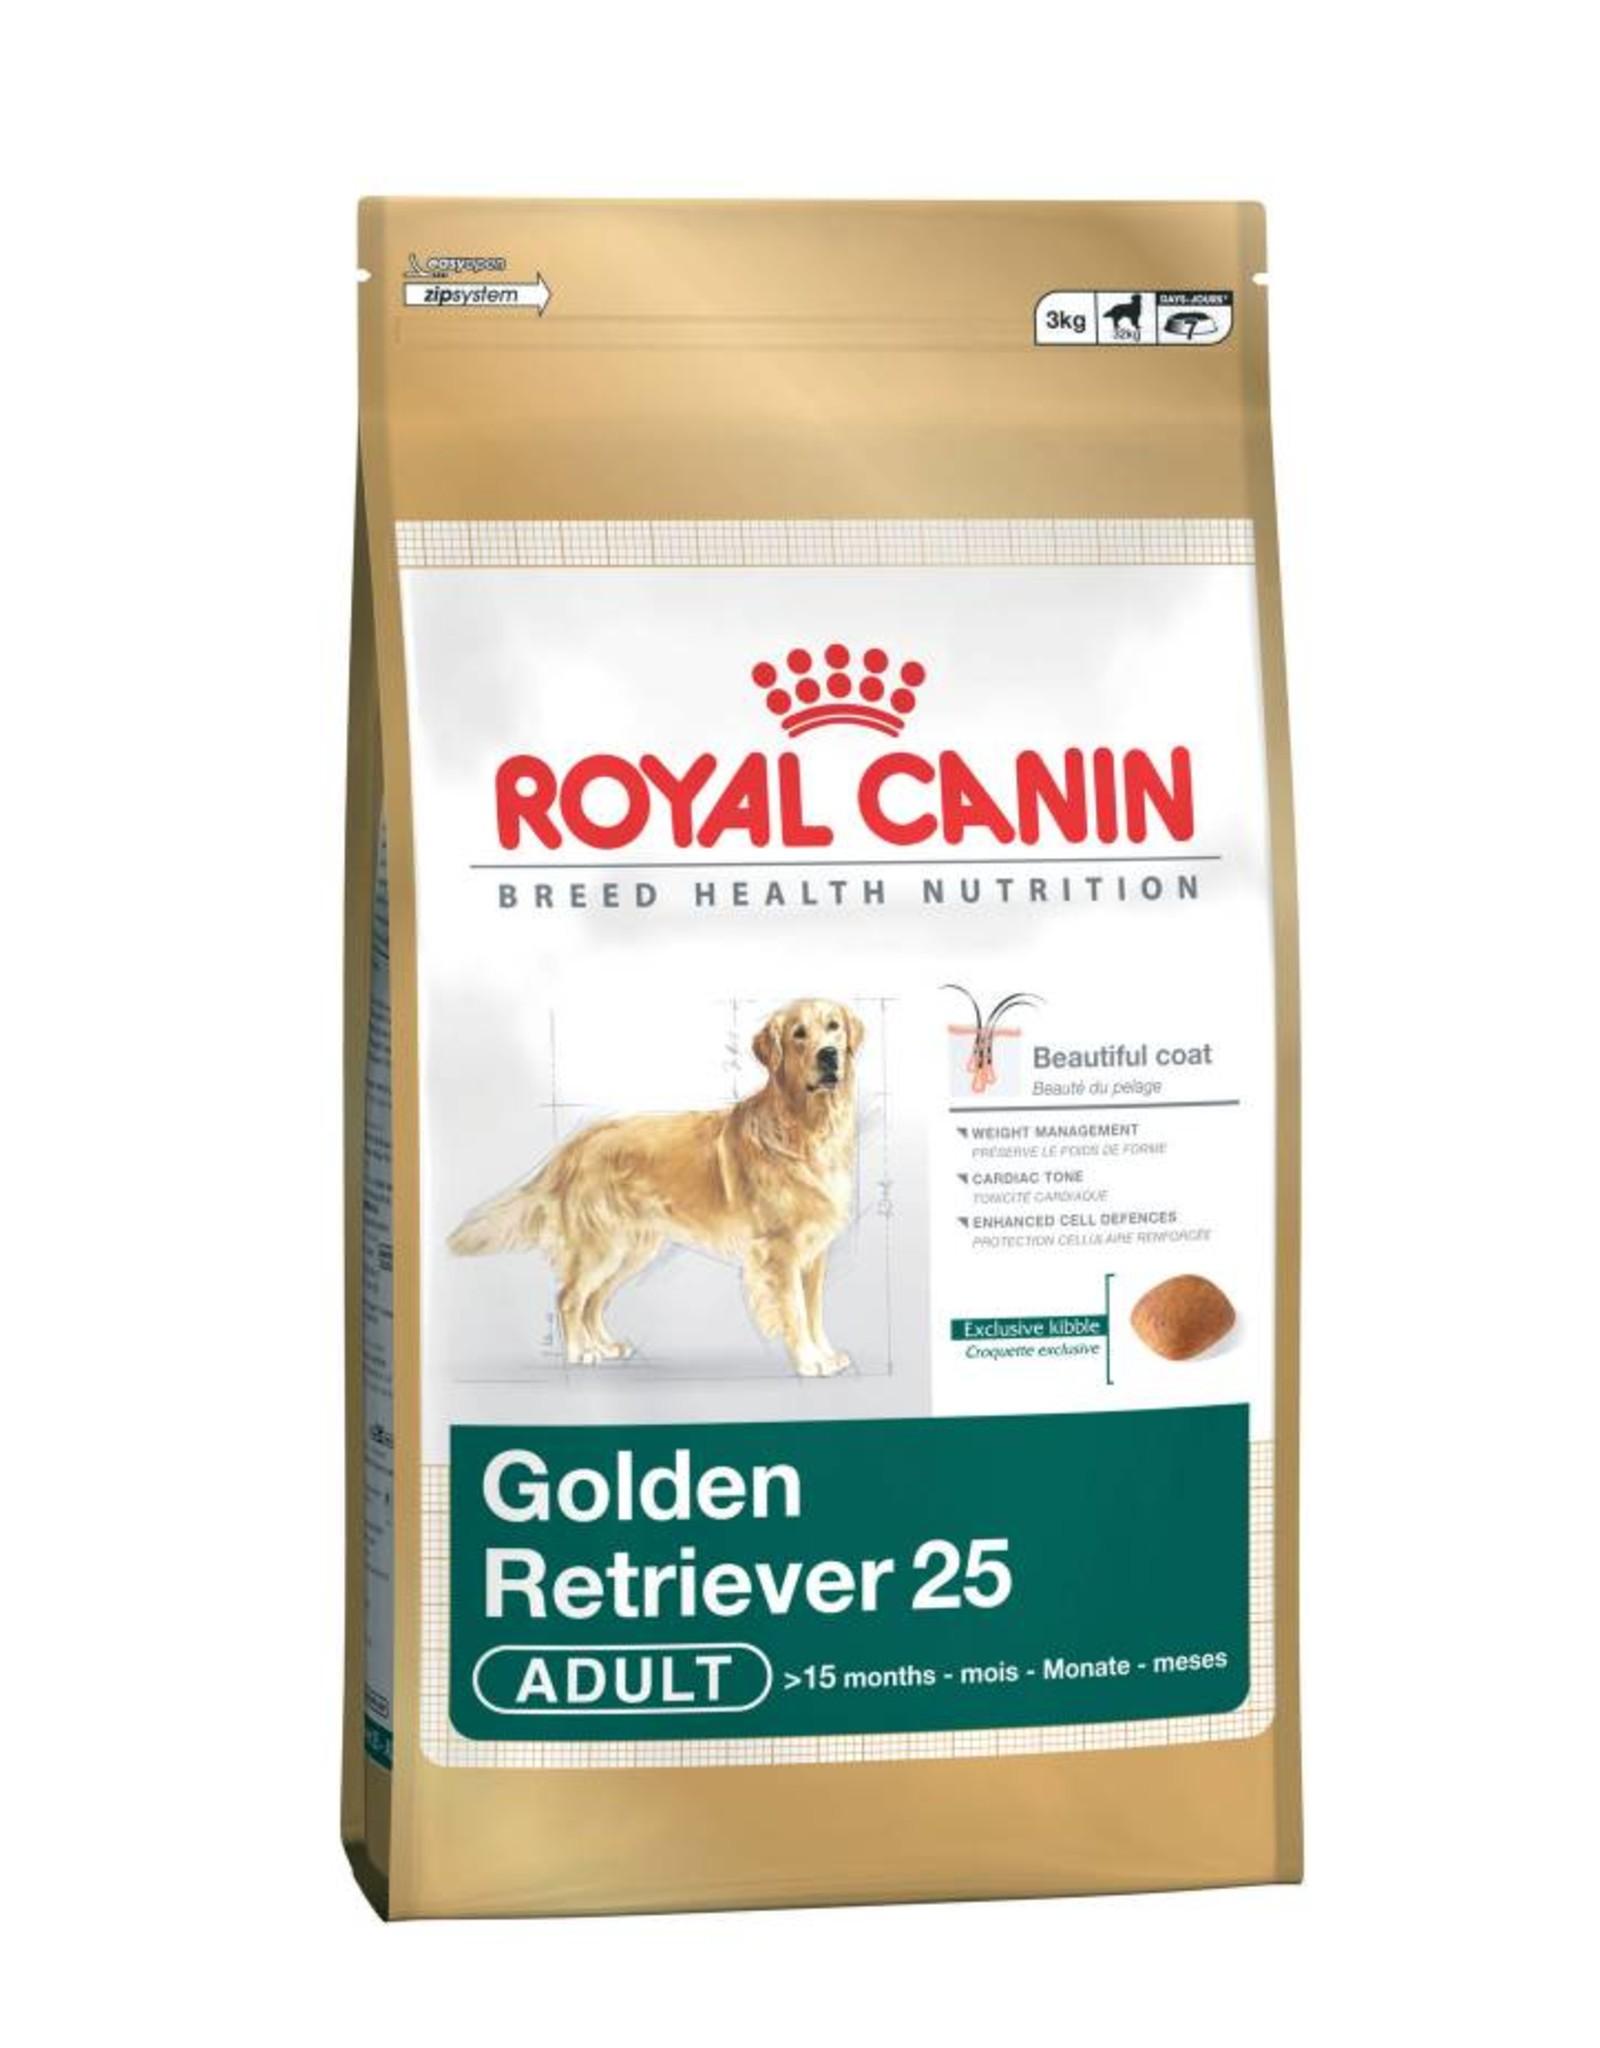 Royal Canin Golden Retriever Adult Dog Dry Food